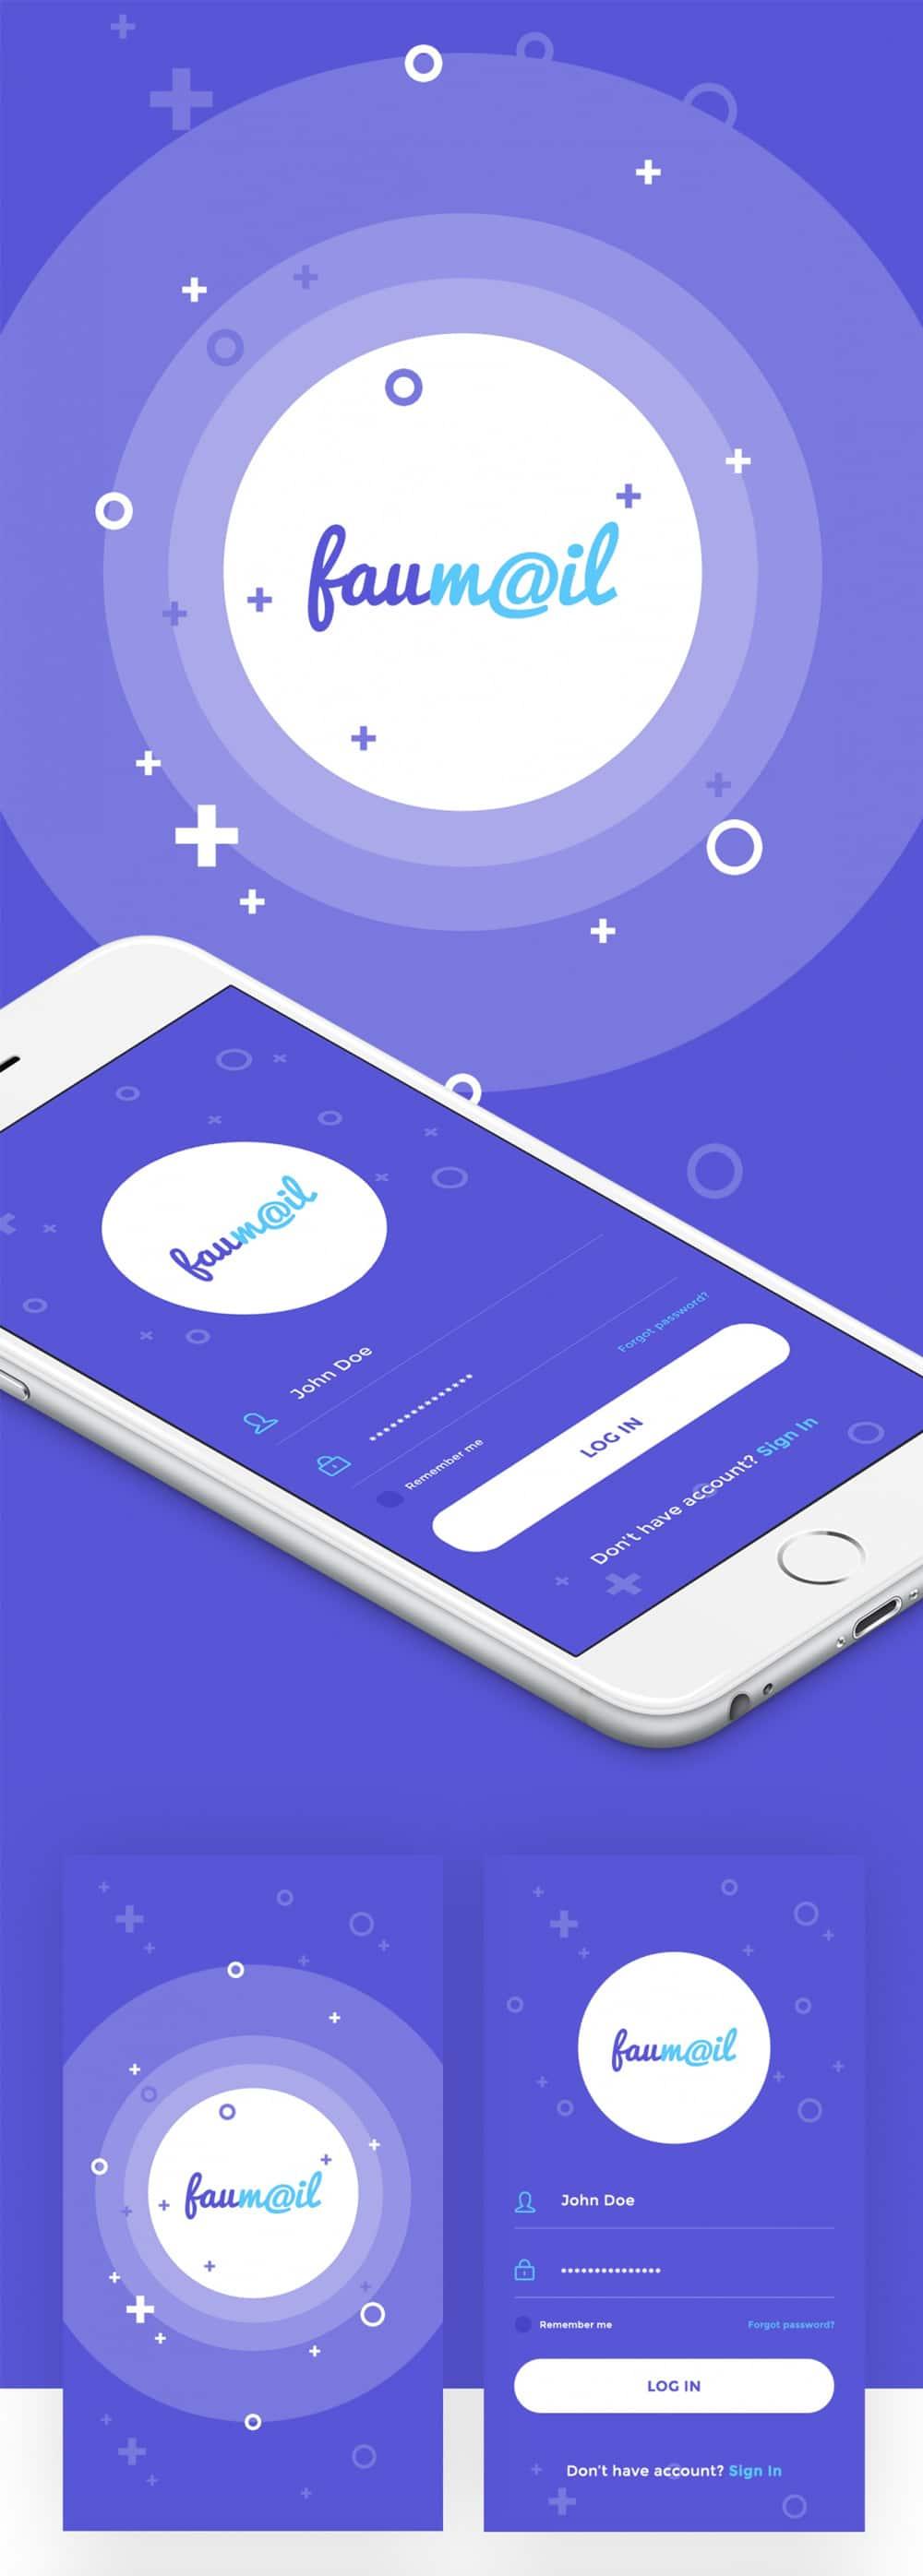 Faumail Mobile App UI PSD